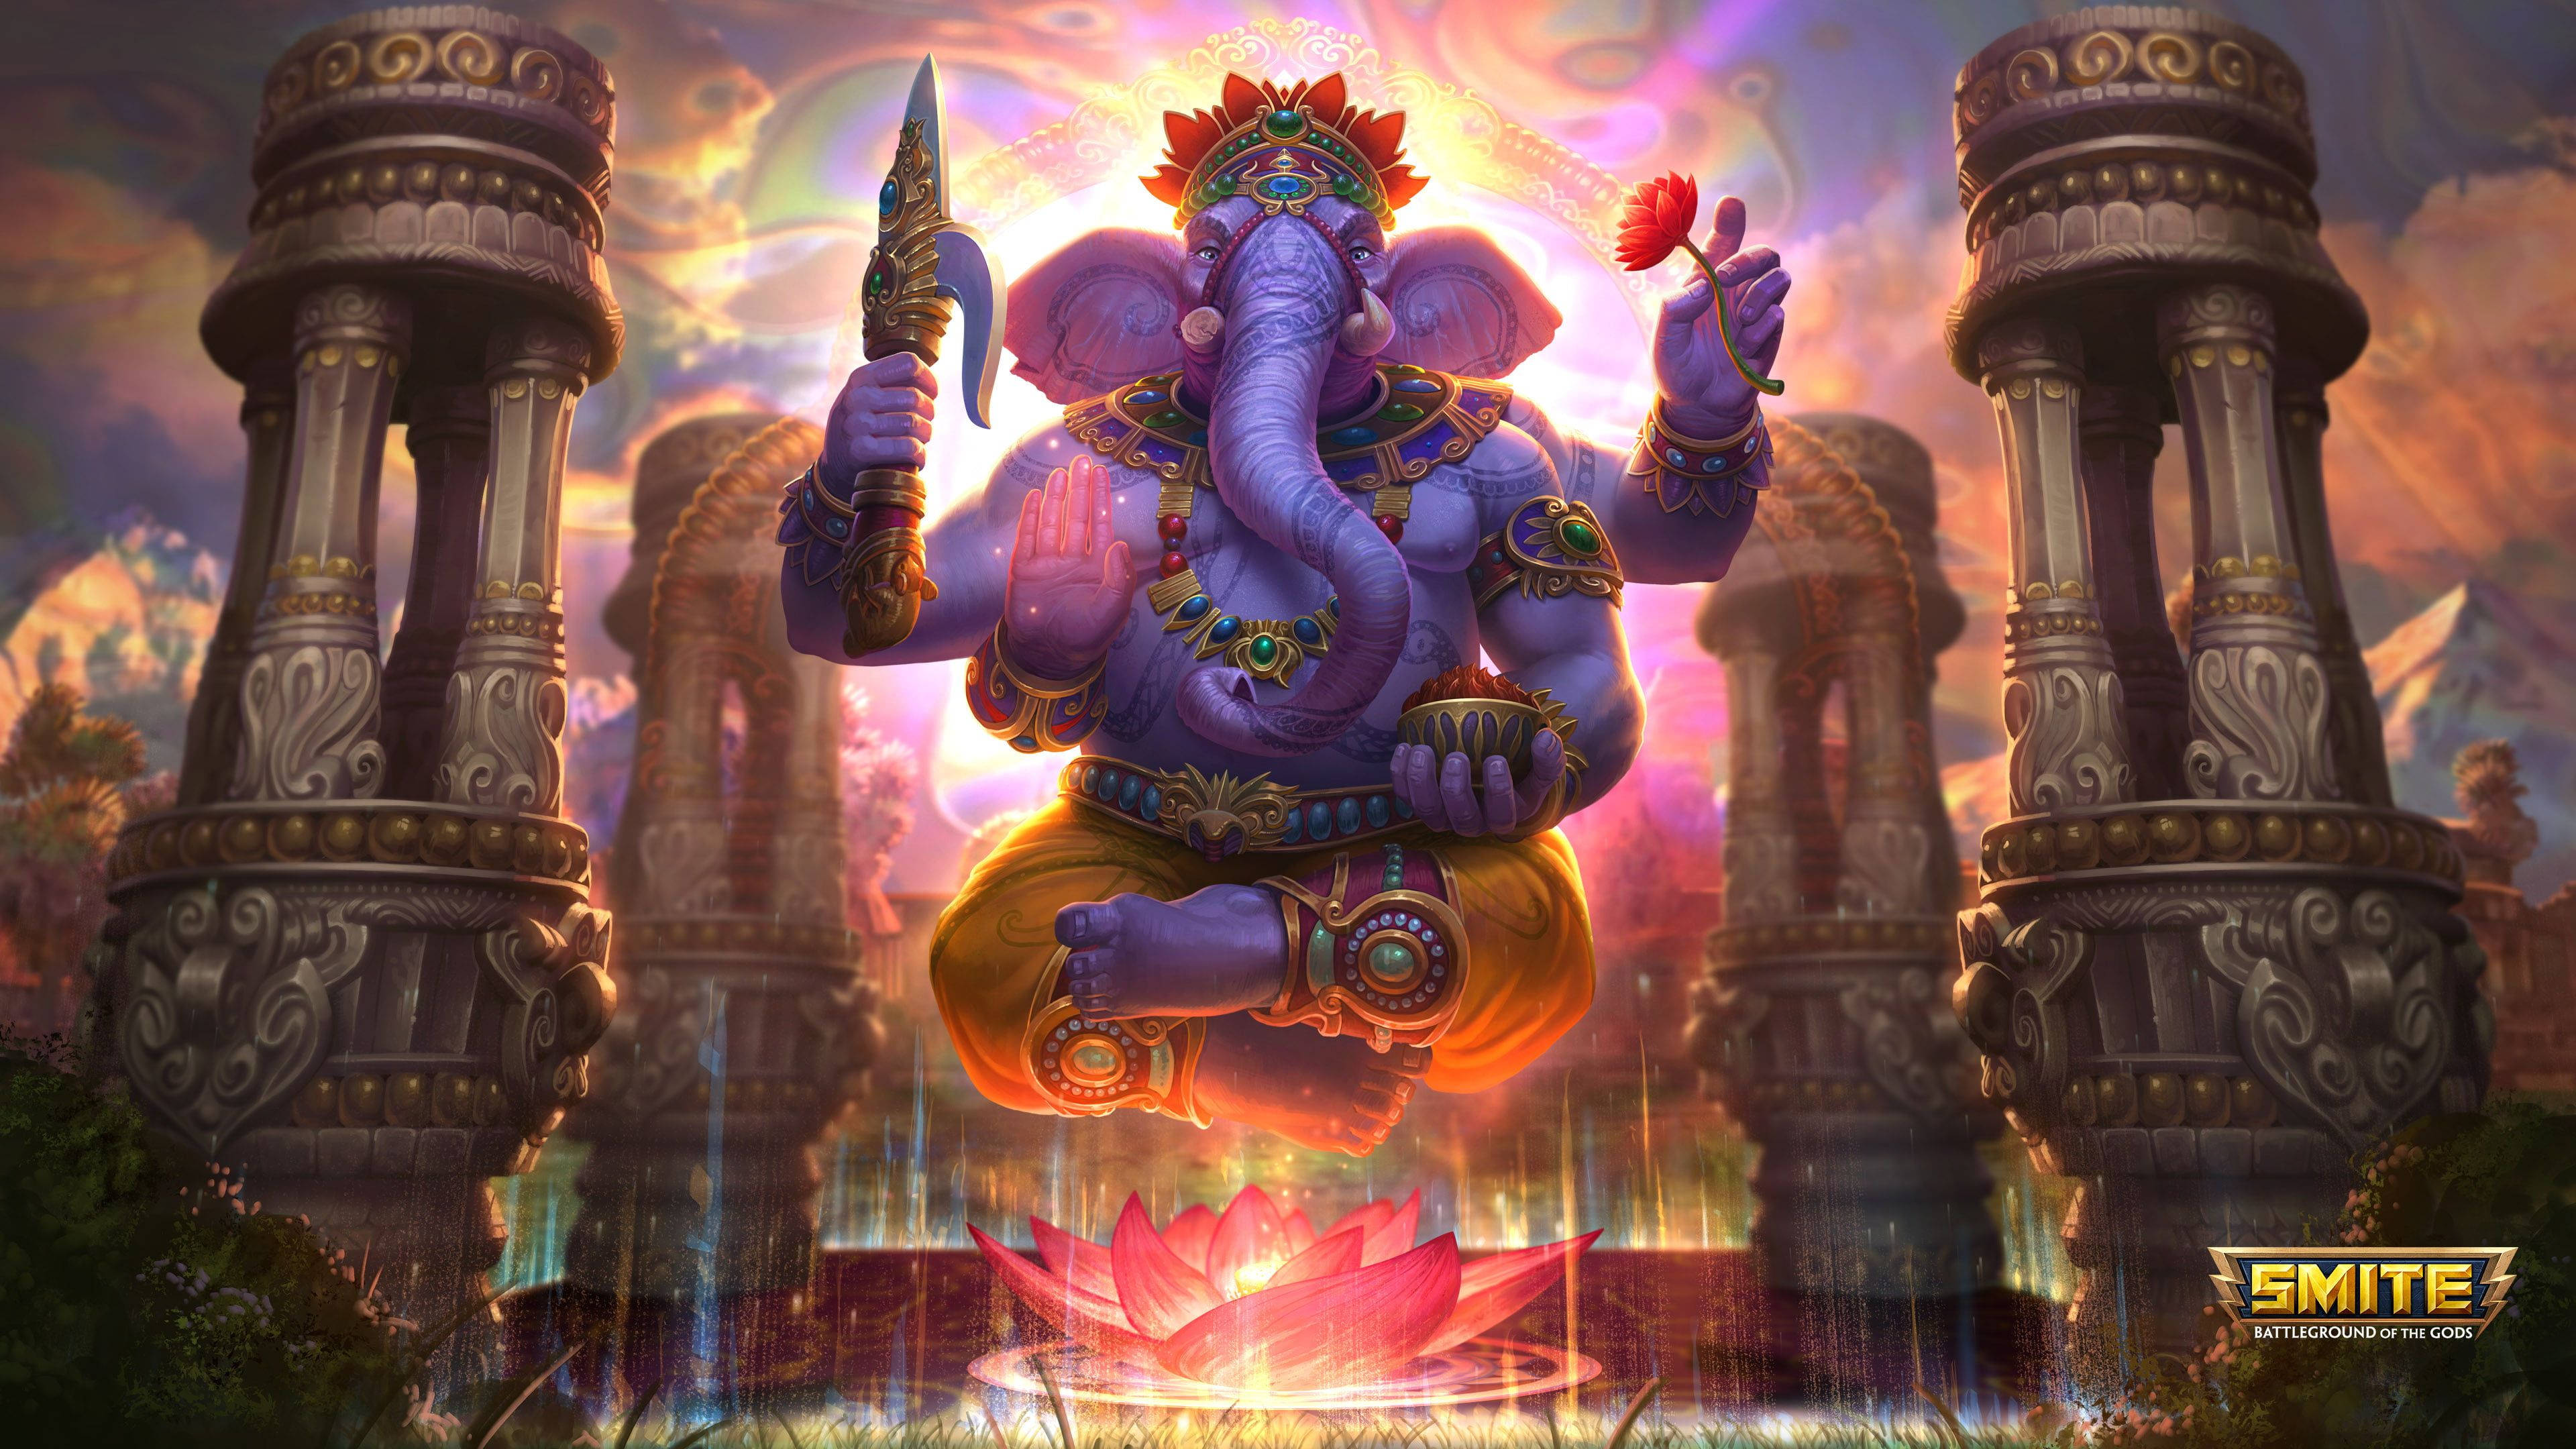 Hình nền 3840x2160 Ganesha, Chúa Ganesha, Ganpati Bappa, Ganapati HD